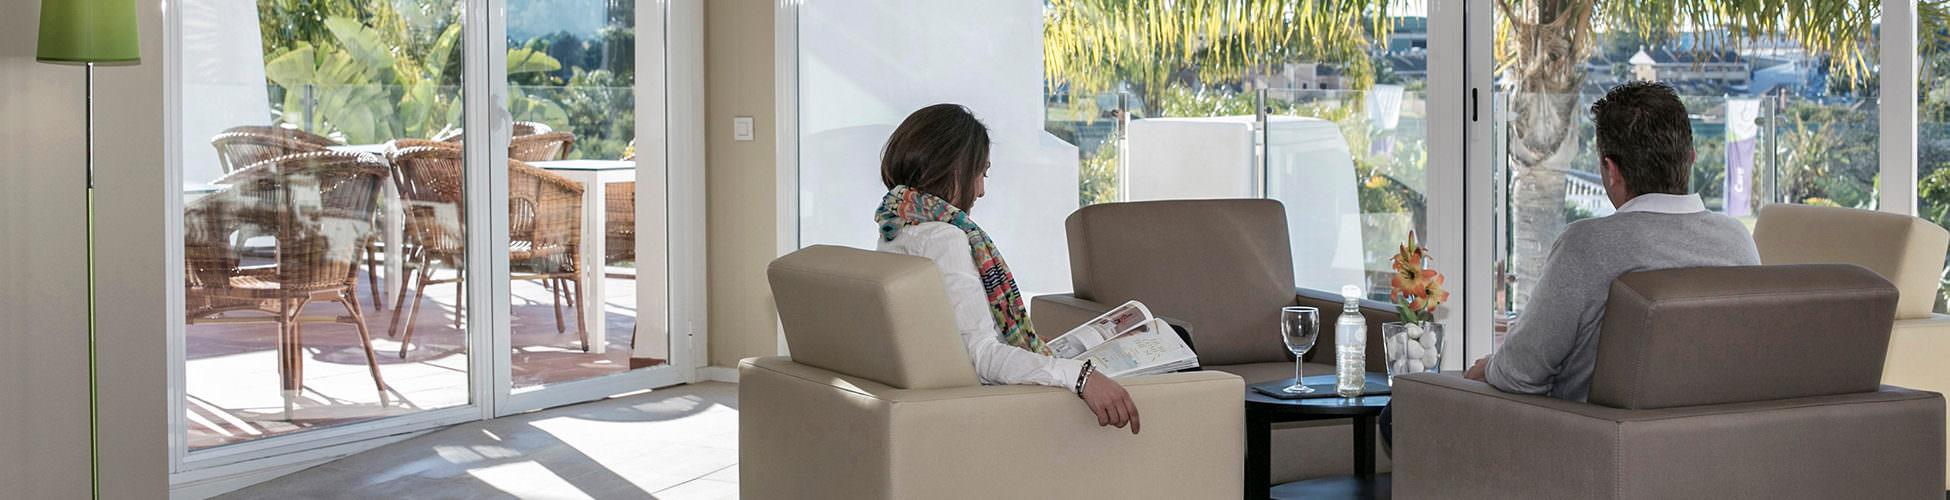 Aldea la Quinta Health Resort for FFS Patients